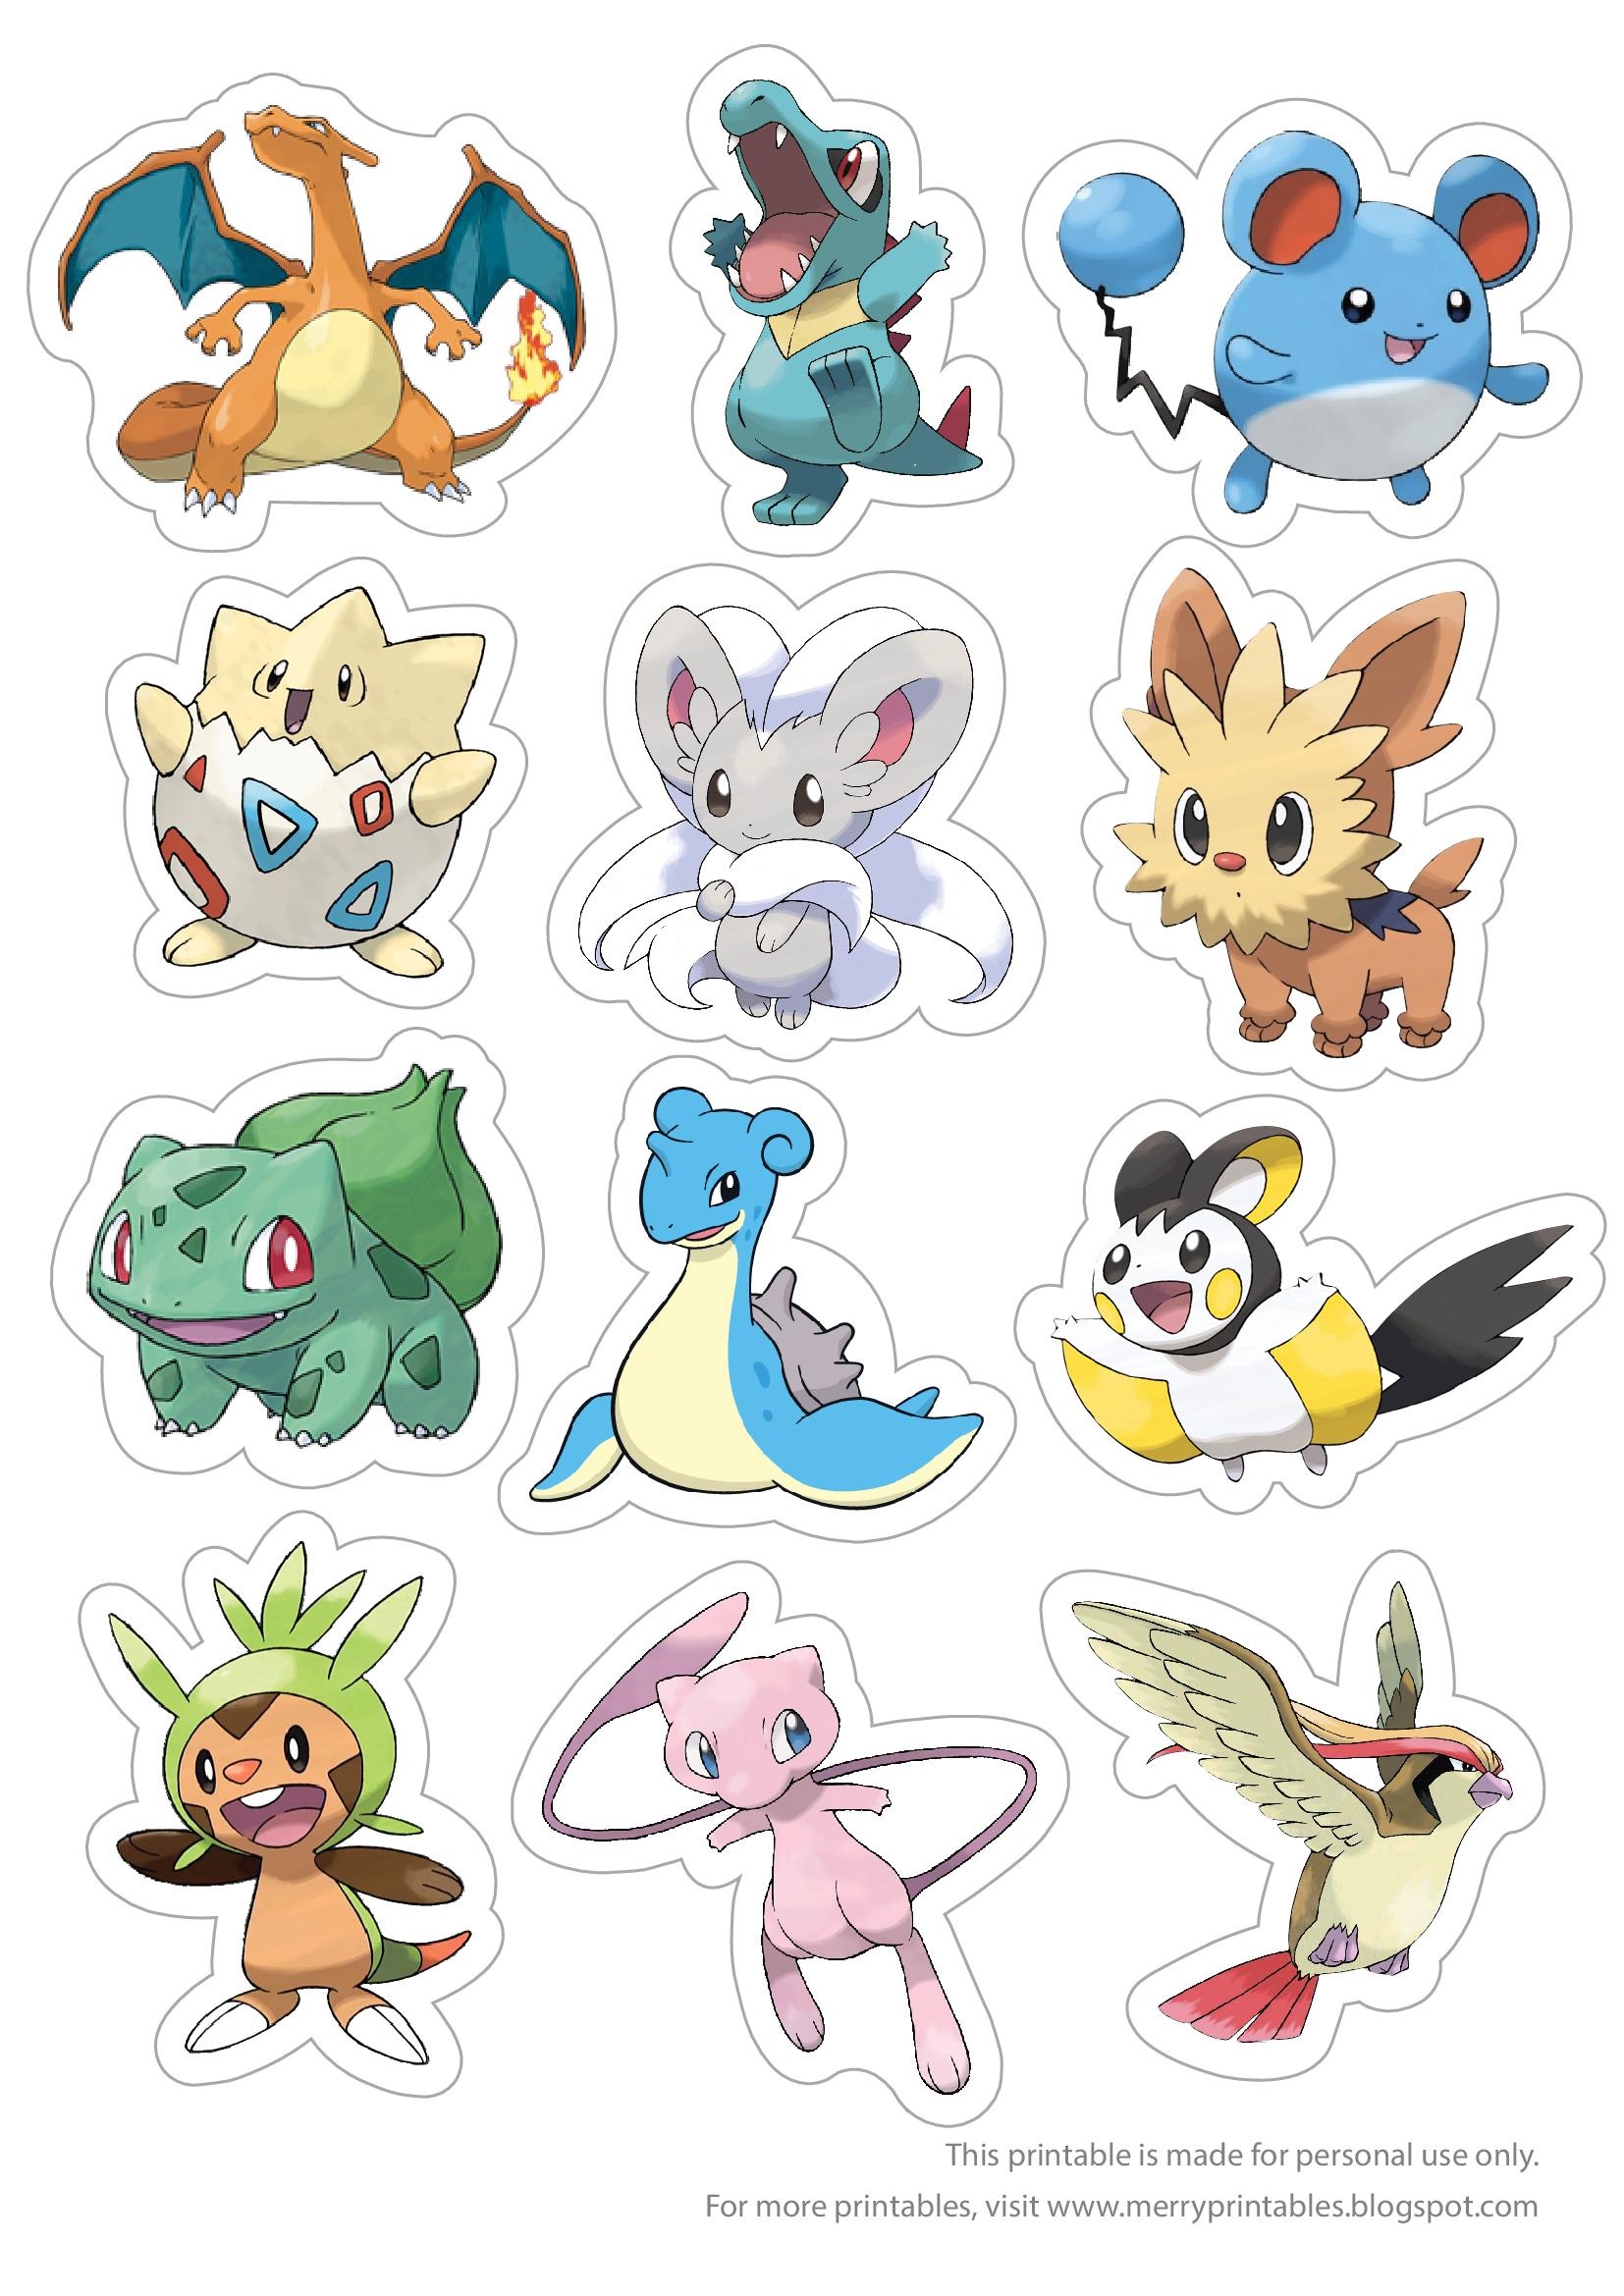 Beau Dessin A Imprimer De Pokemon Gx